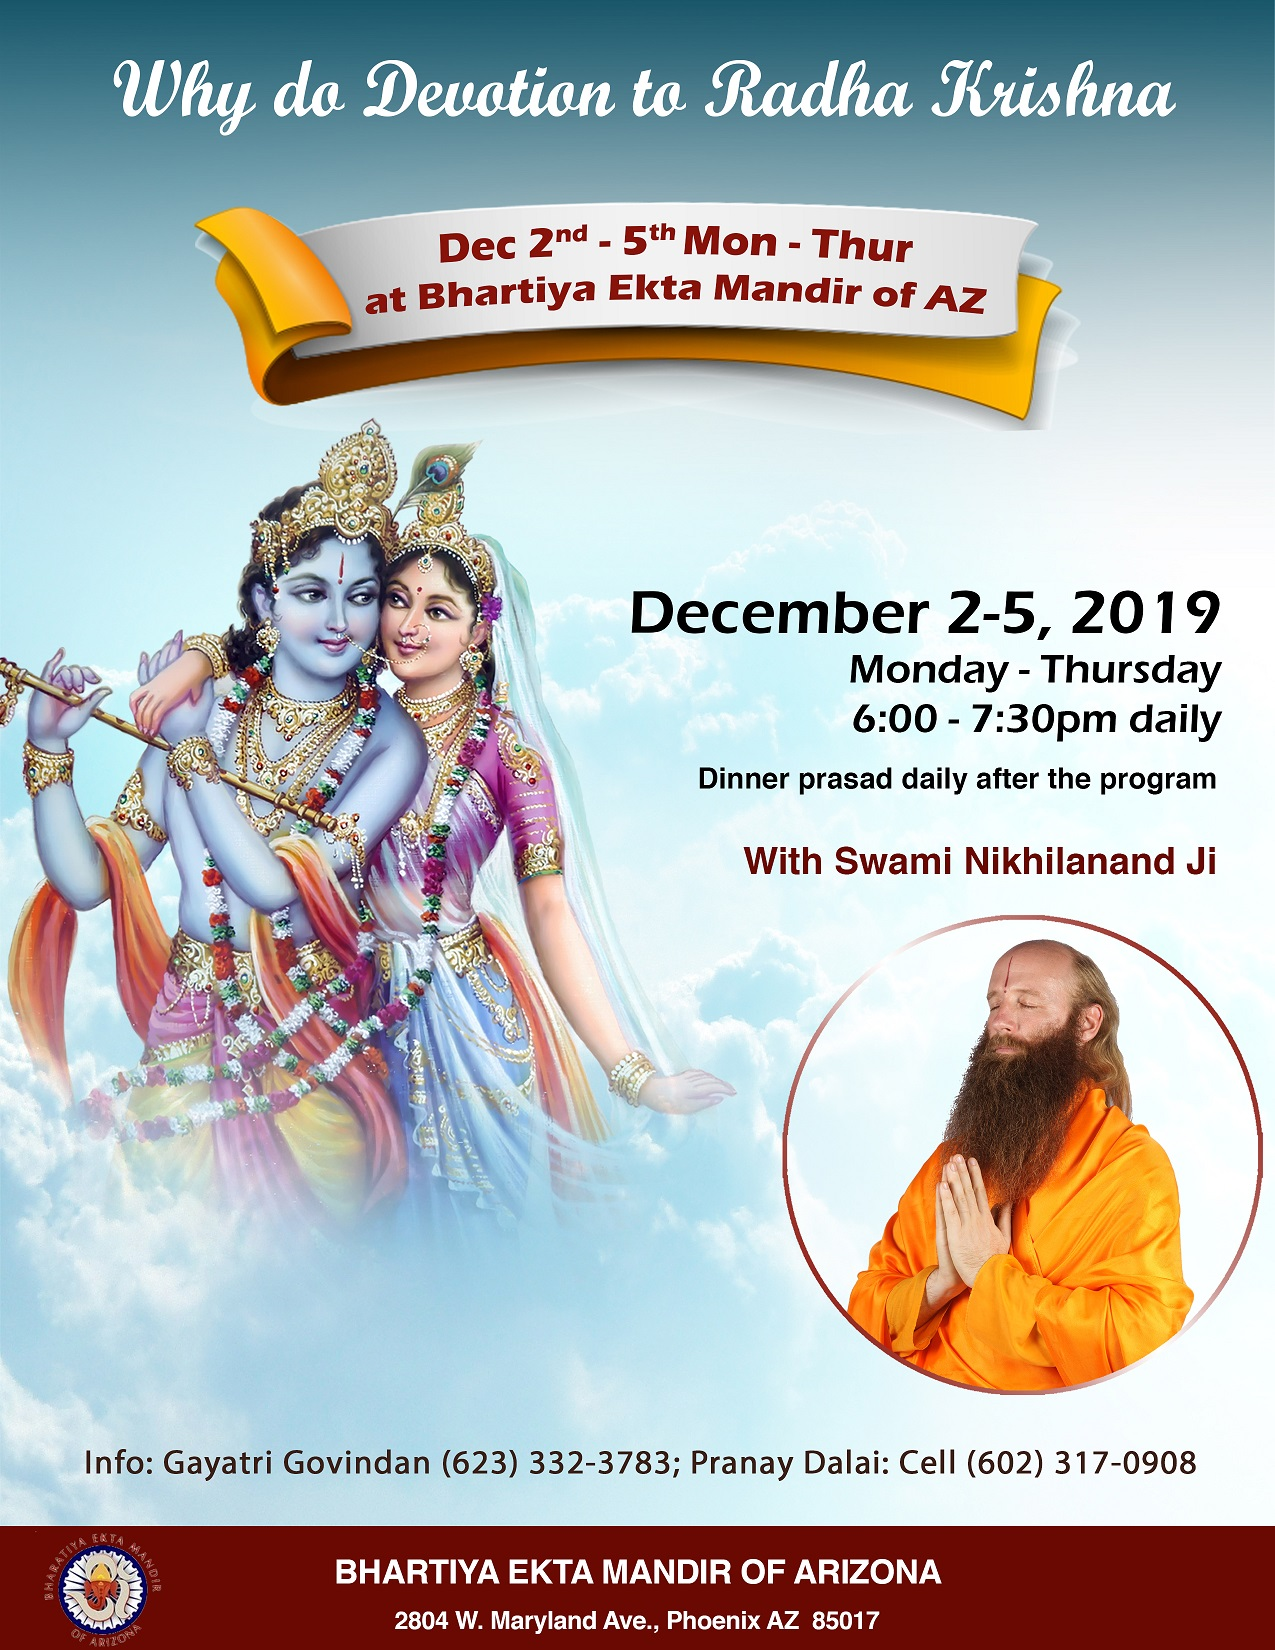 2Why do devotion to RK Dec 2019 v2